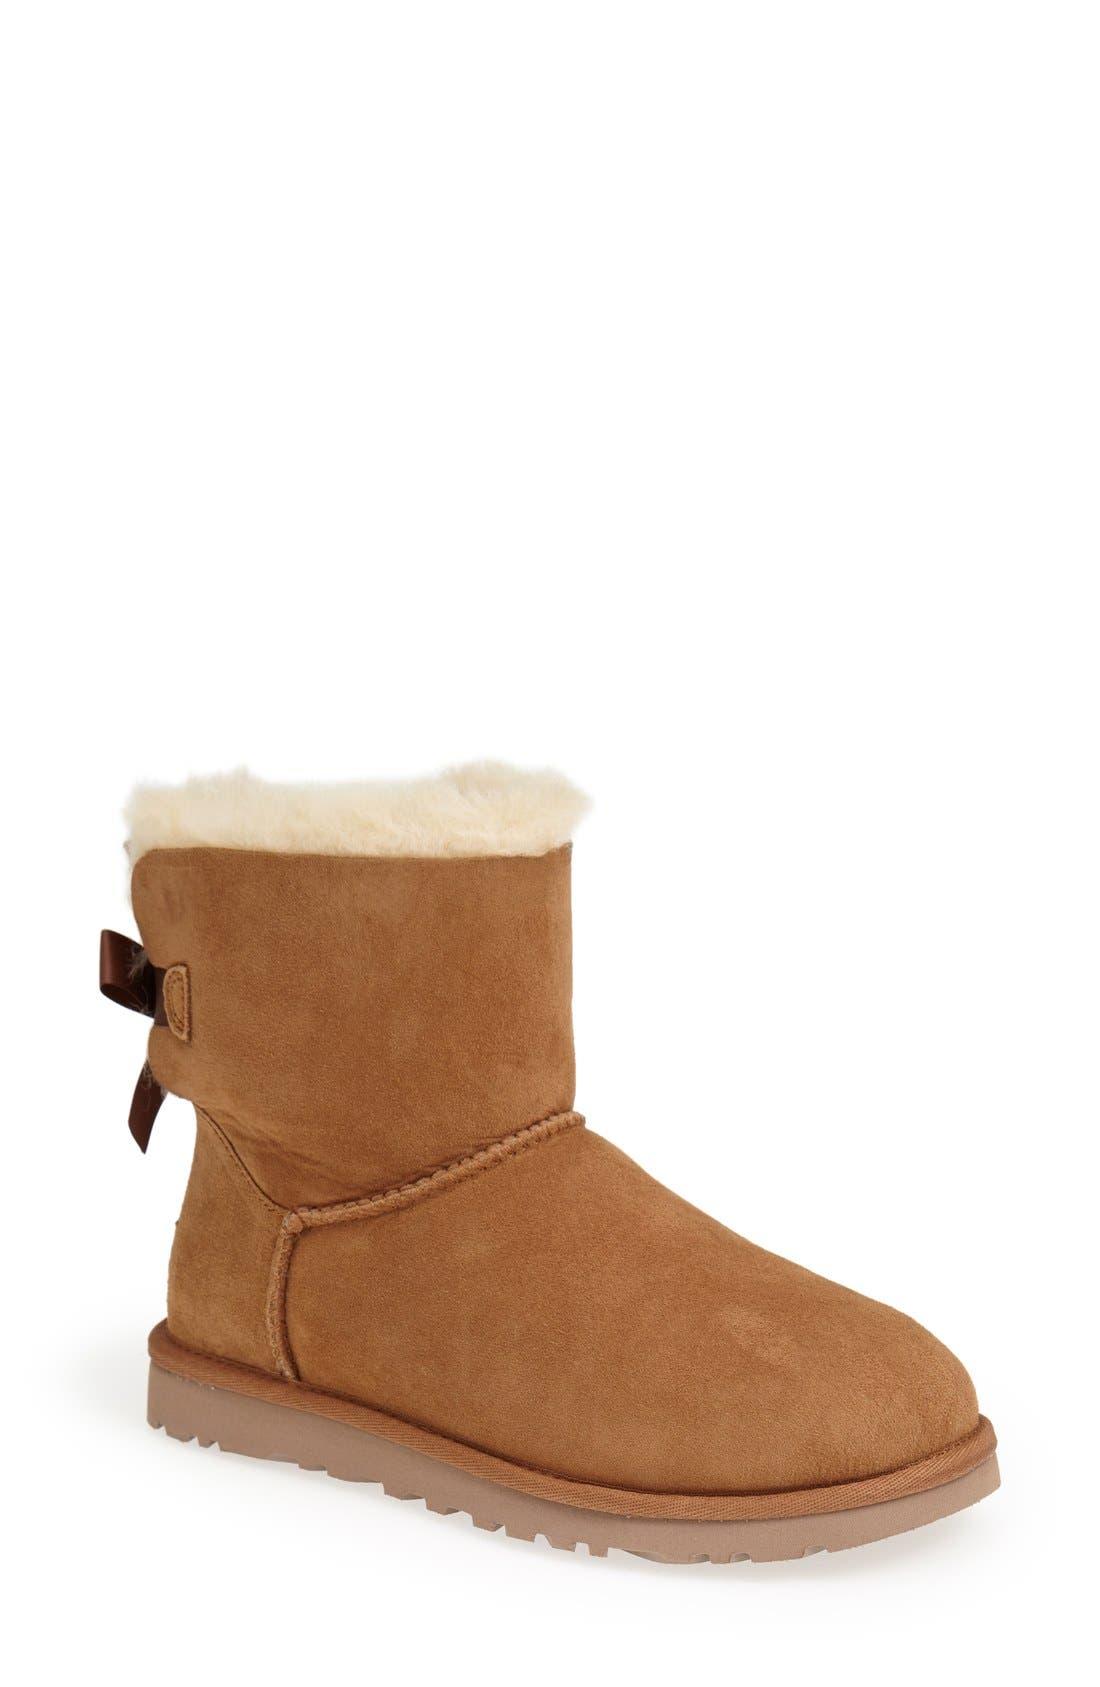 Alternate Image 1 Selected - UGG® 'Mini Bailey Bow' Boot (Women)